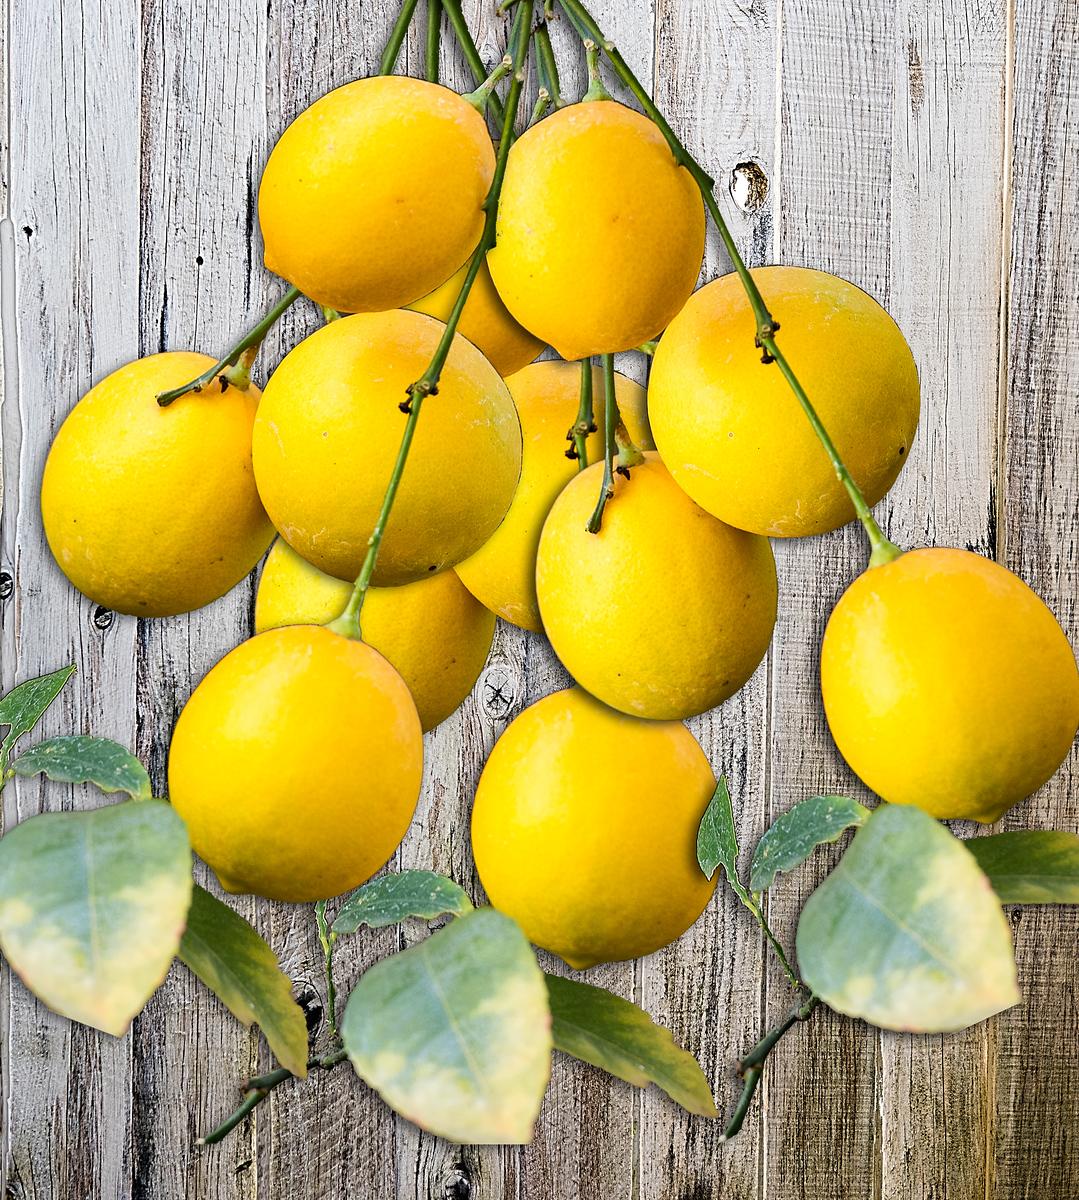 bundle of lemons on the vine-wood background 9369